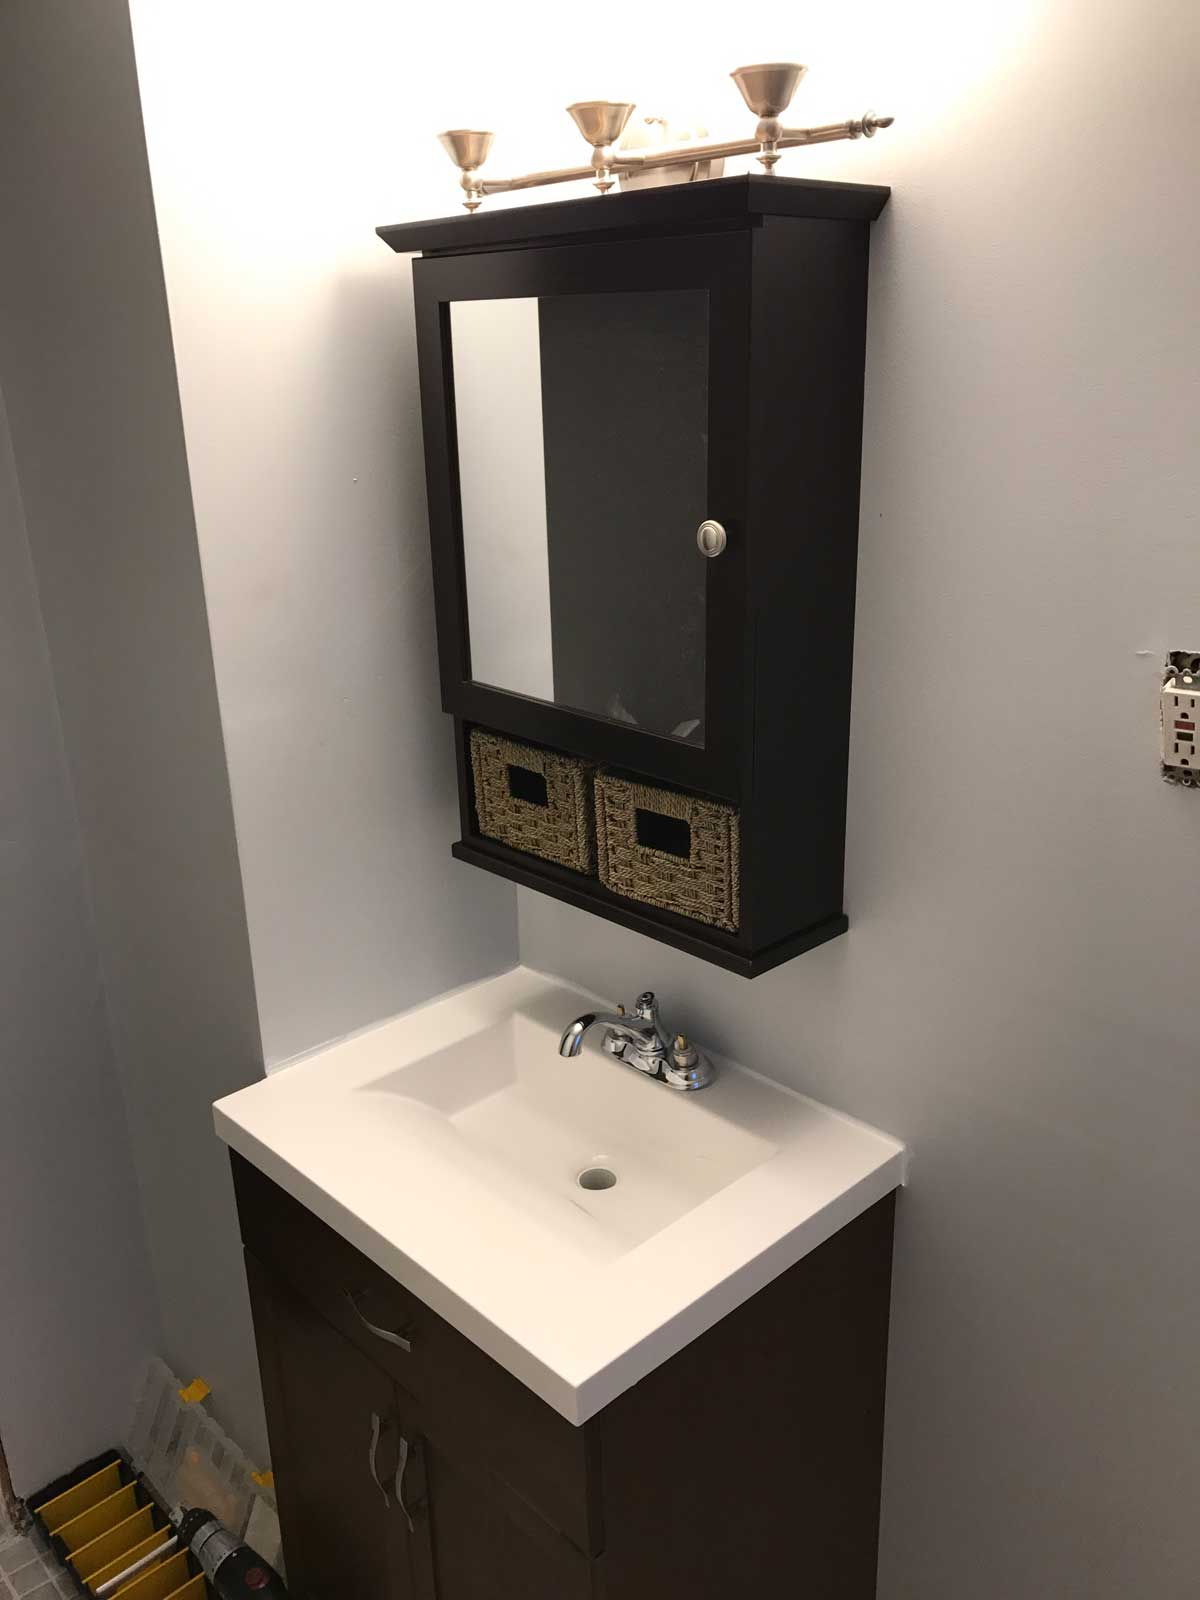 15-Day-Bathroom-Renovation-27.jpg